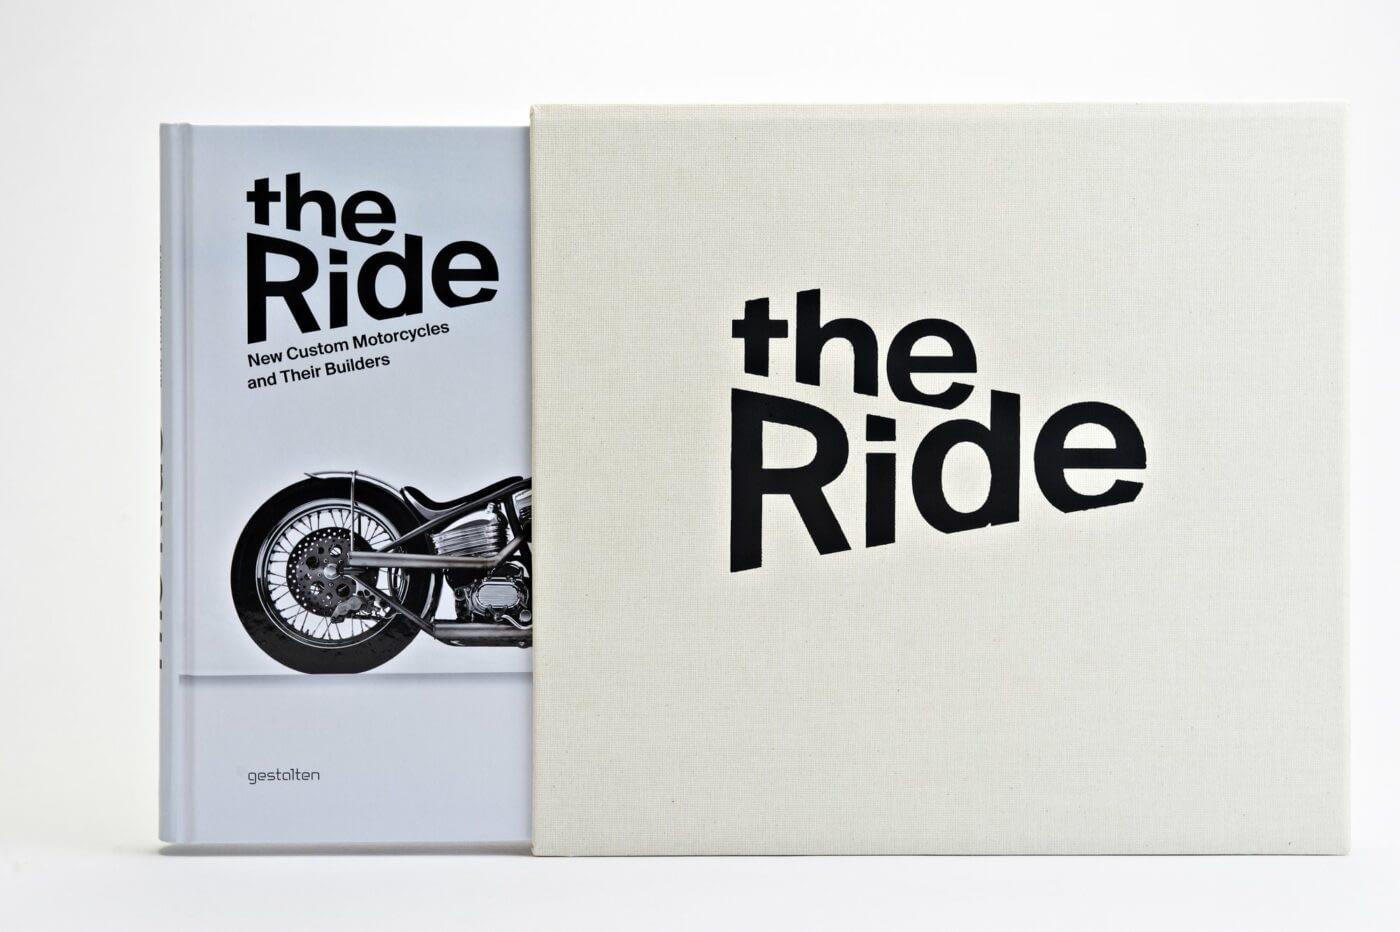 The Ride Book, Cover - Custom Motorräder Inspiration, Ibbenbüren